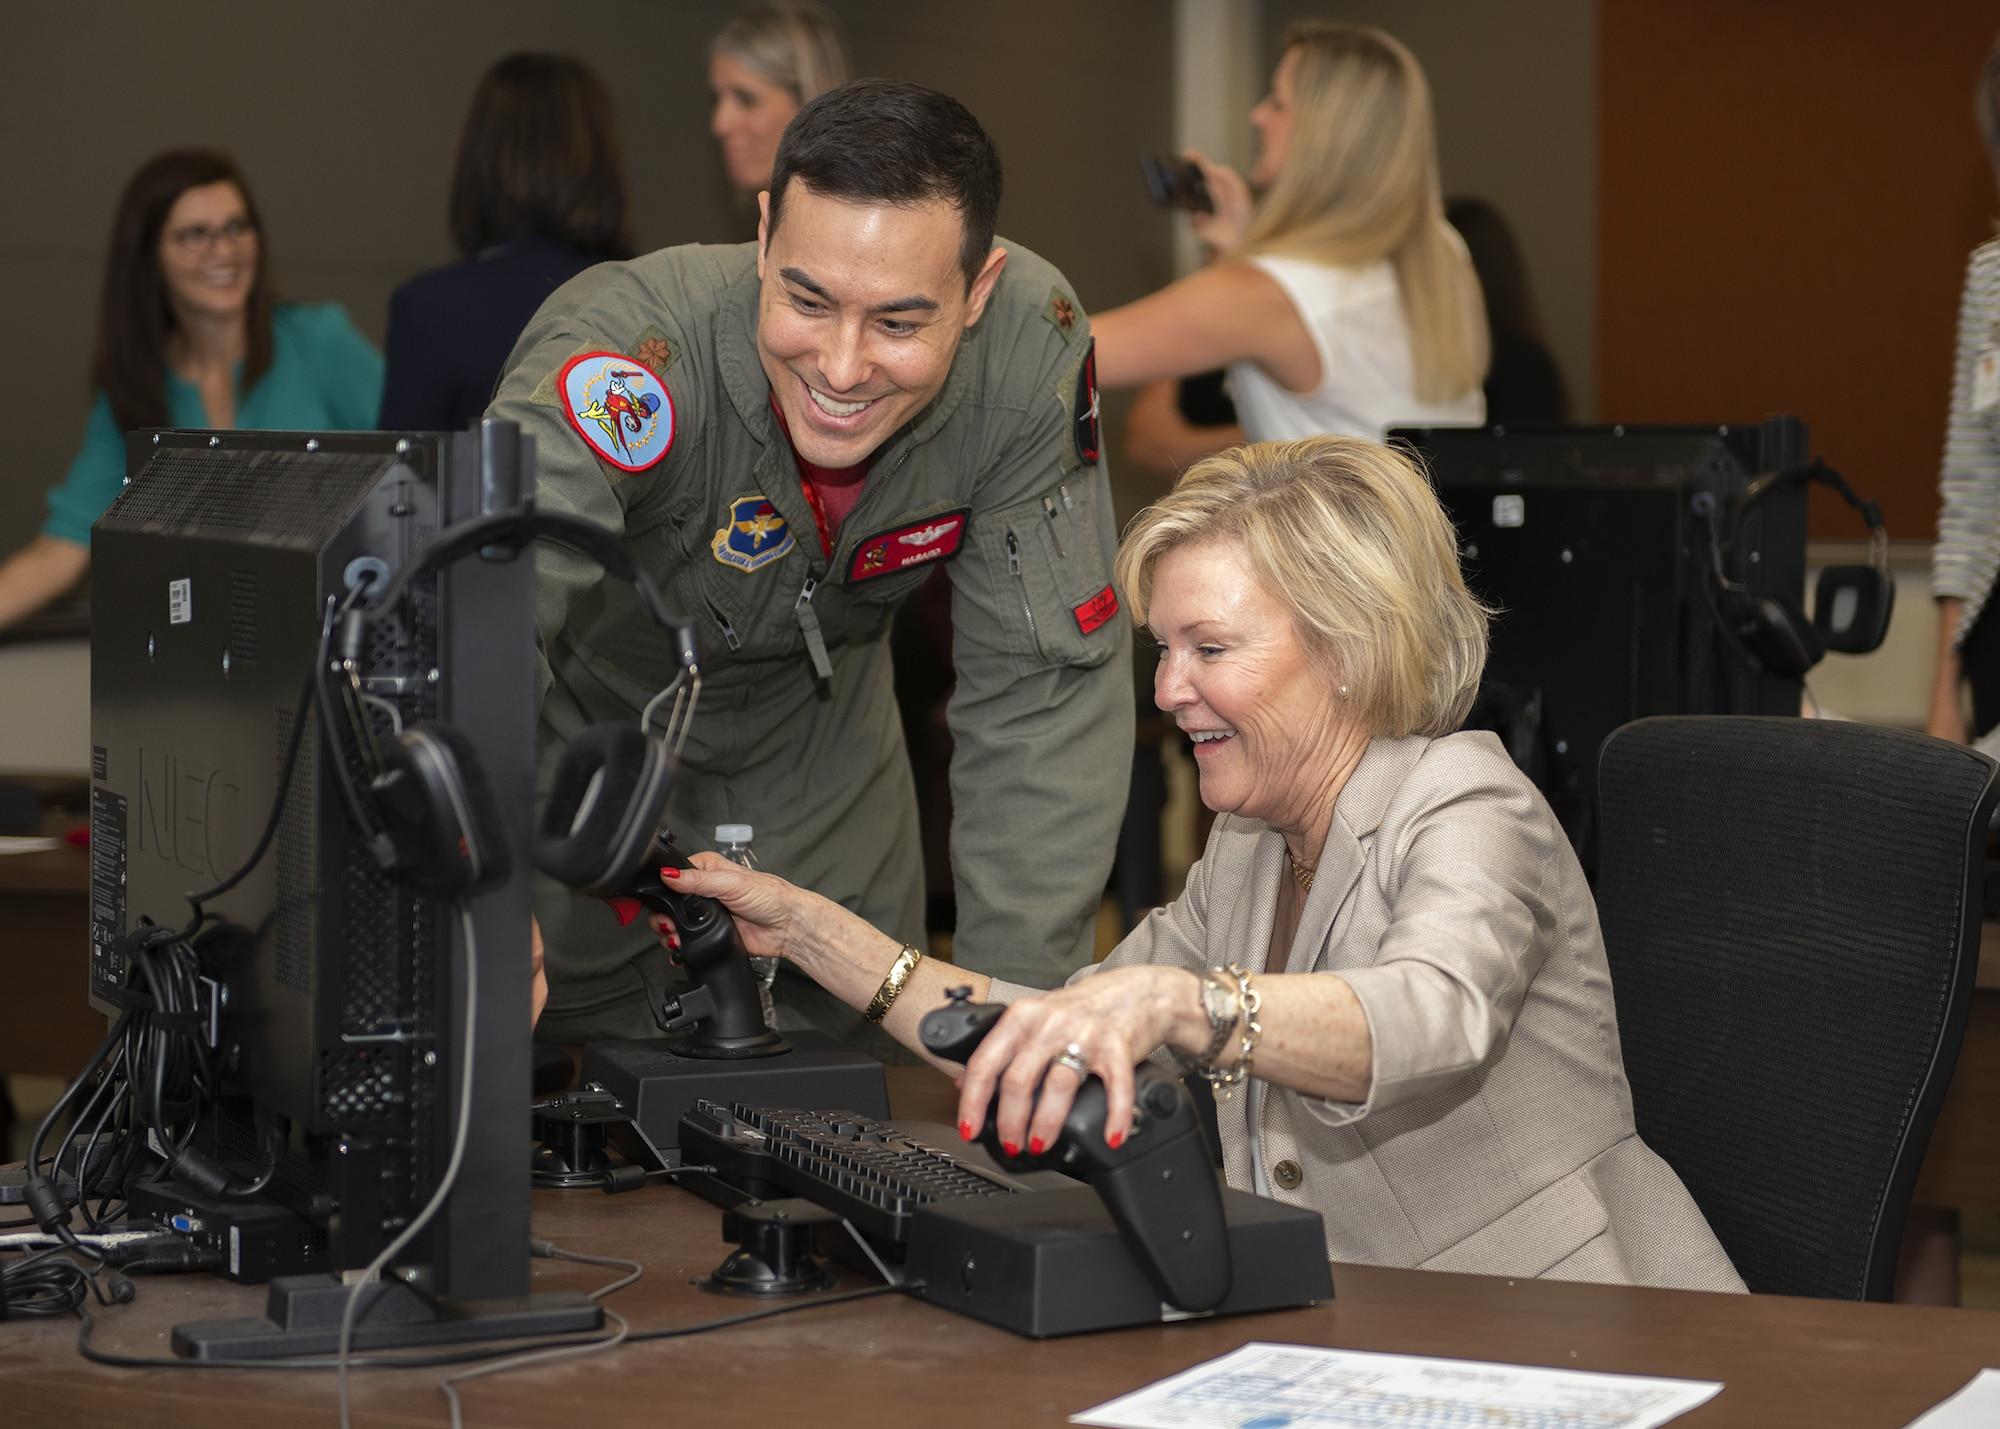 Maj. Justin Lee, 56th Training Squadron instructor pilot, shows Dawn Goldfien, wife of Air Force Chief of Staff Gen. David L. Goldfein, how to operate an F-35A Lightning II simulator at Luke Air Force Base, Ariz., Nov. 8, 2019.